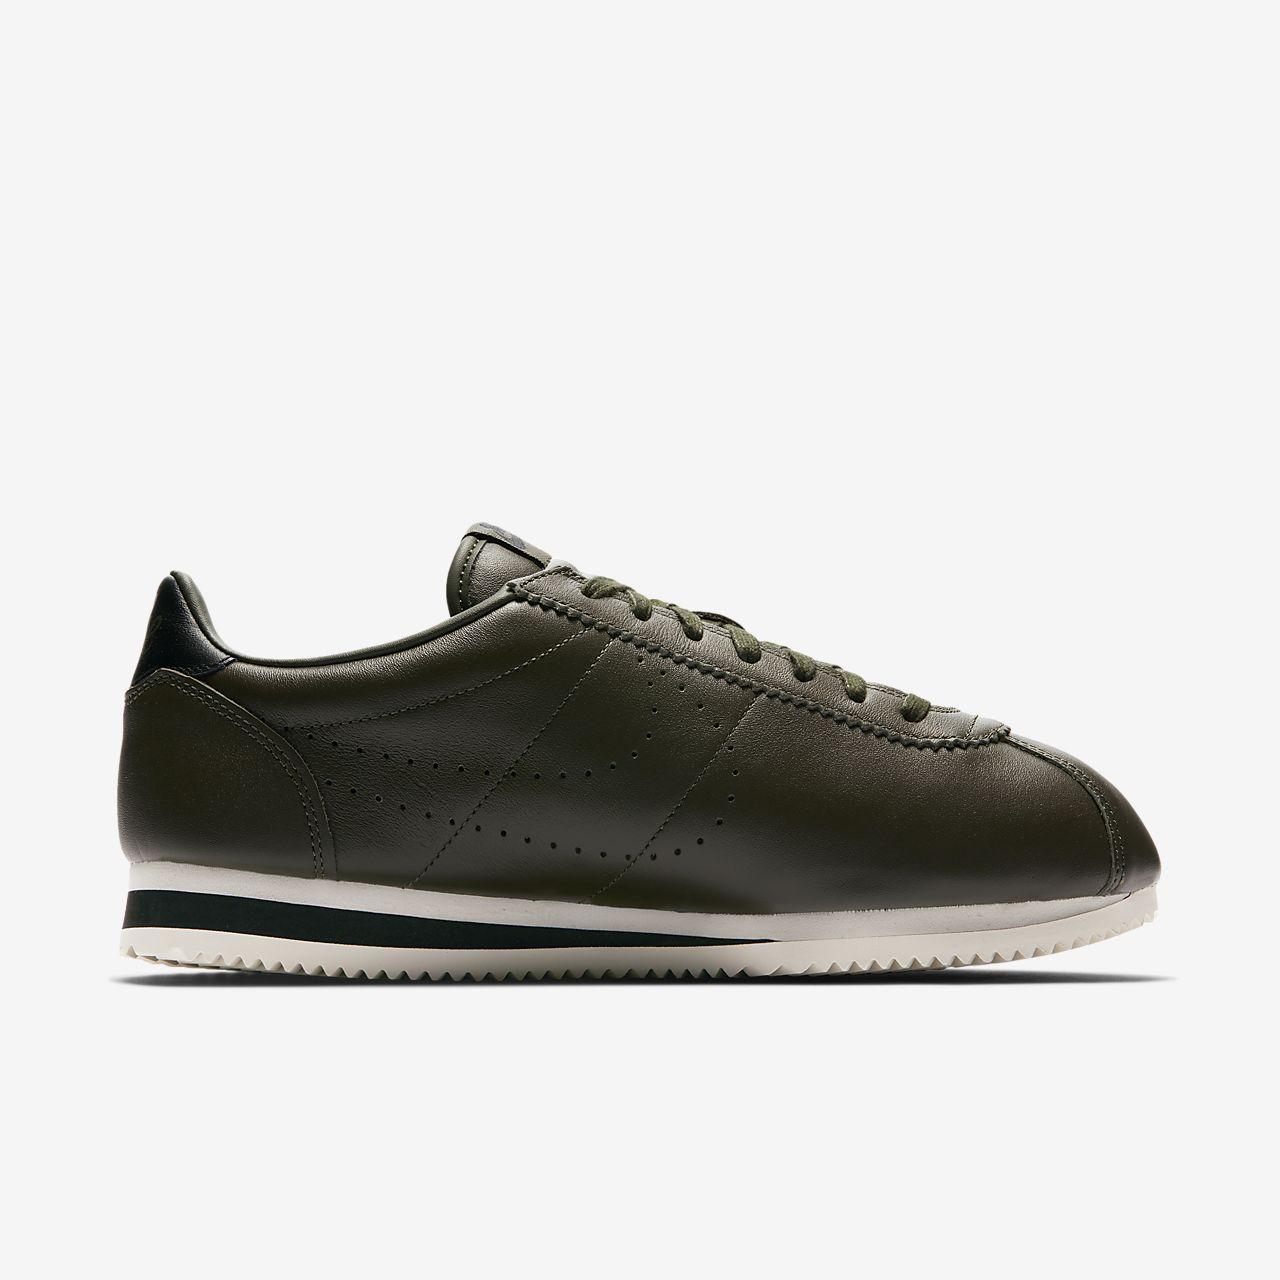 nike classic cortez leather premiun